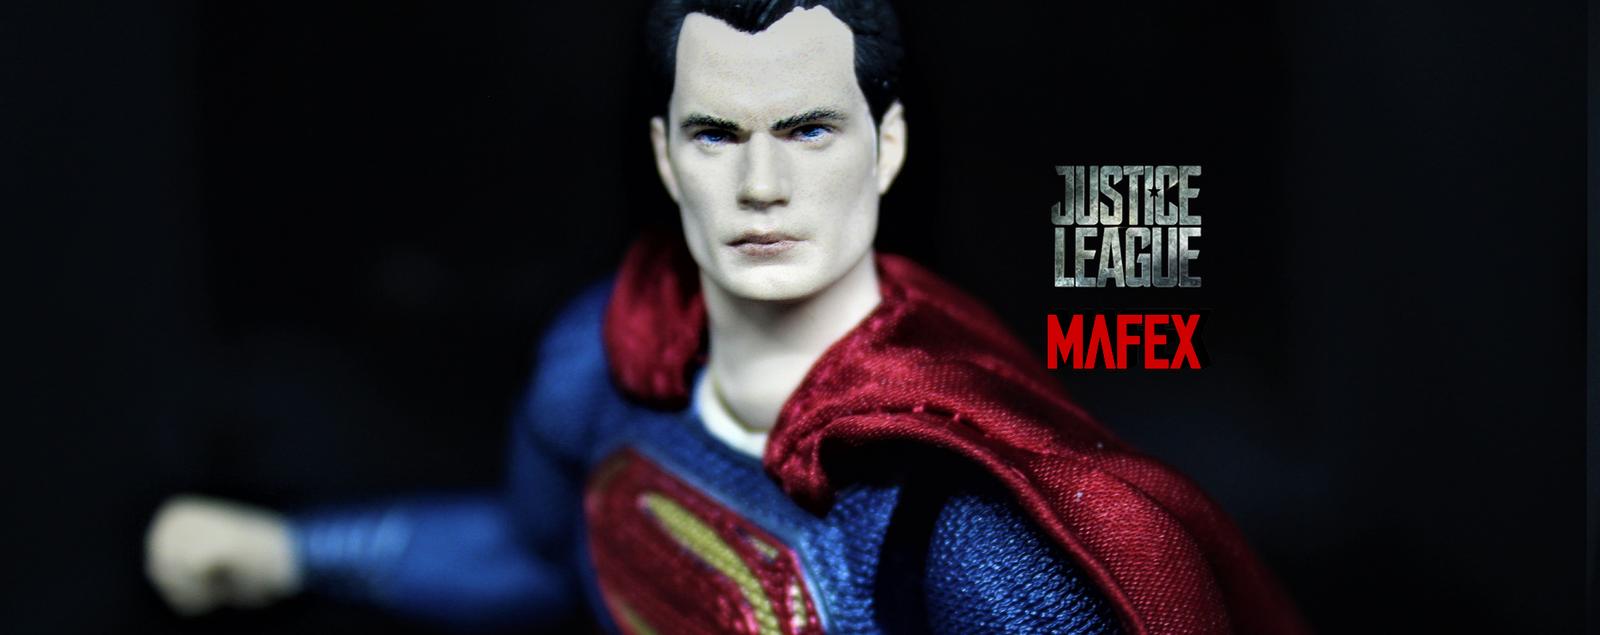 Recensione: Superman JL Mafex di Medicom Toy